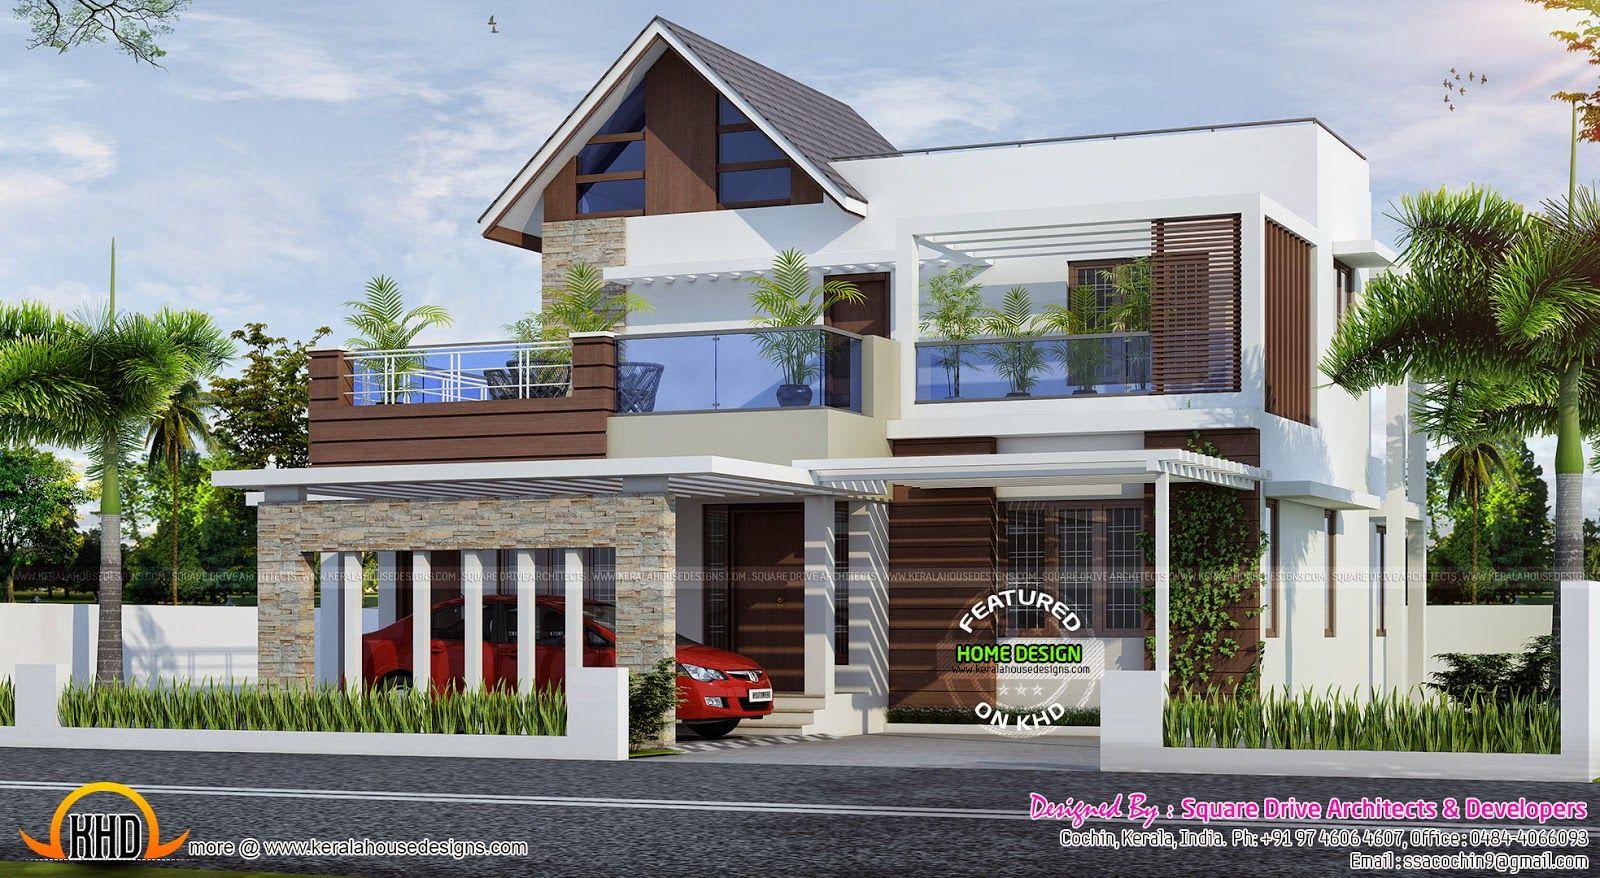 Kerala Modern House Home Designs Pinterest Home Design Home - Colonial style home design in kerala